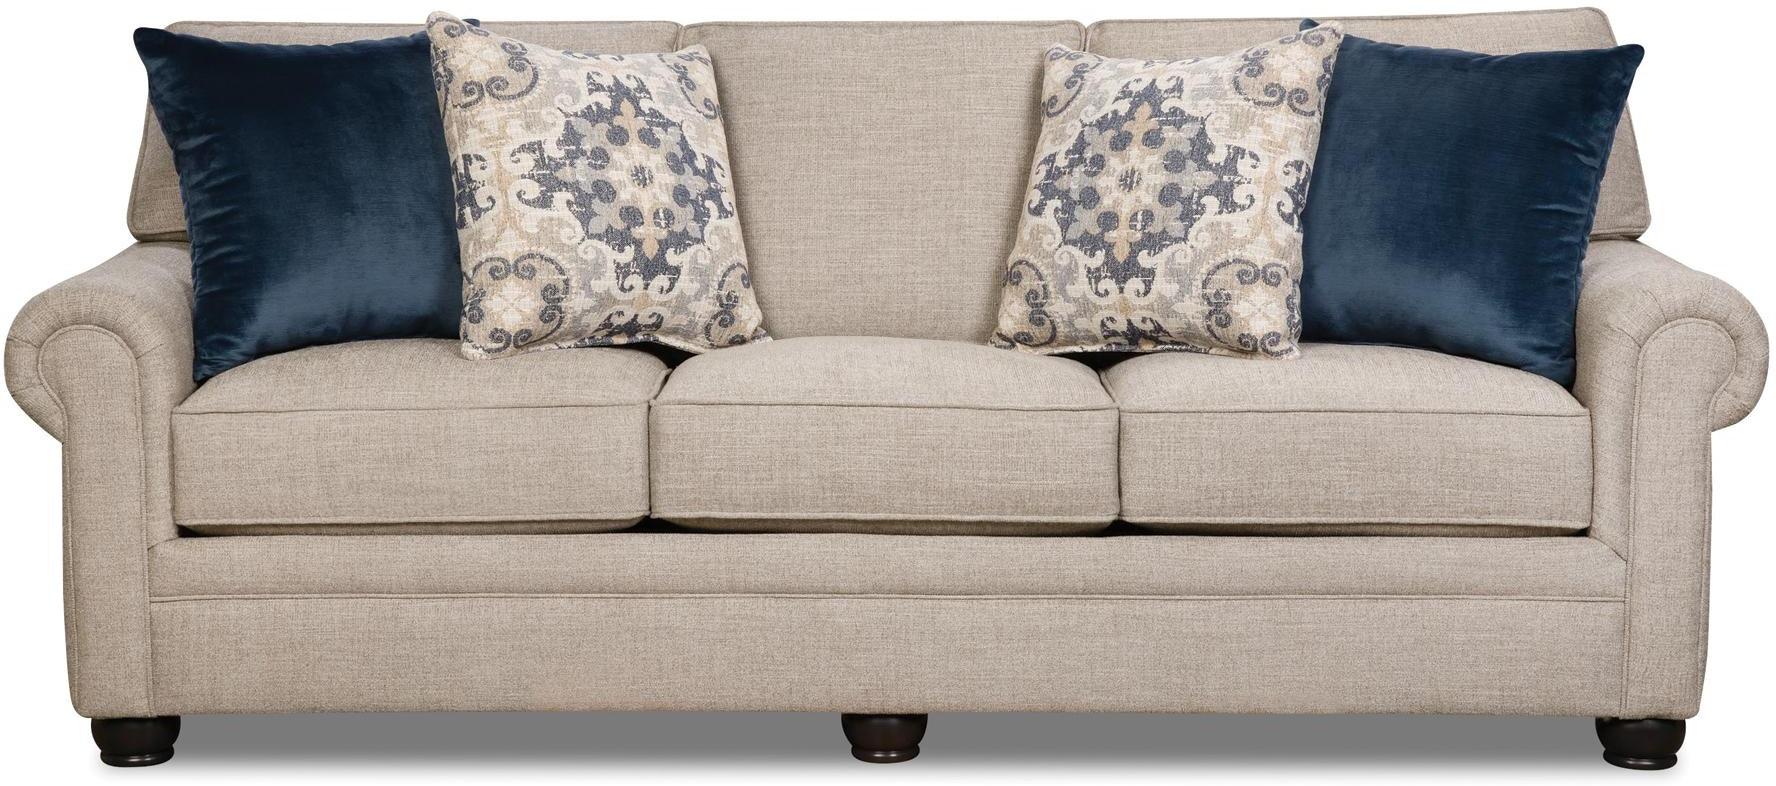 Corinthian Living Room Lilou Sleeper Sofa 056627 Furniture Fair Cincinnati Dayton Oh And